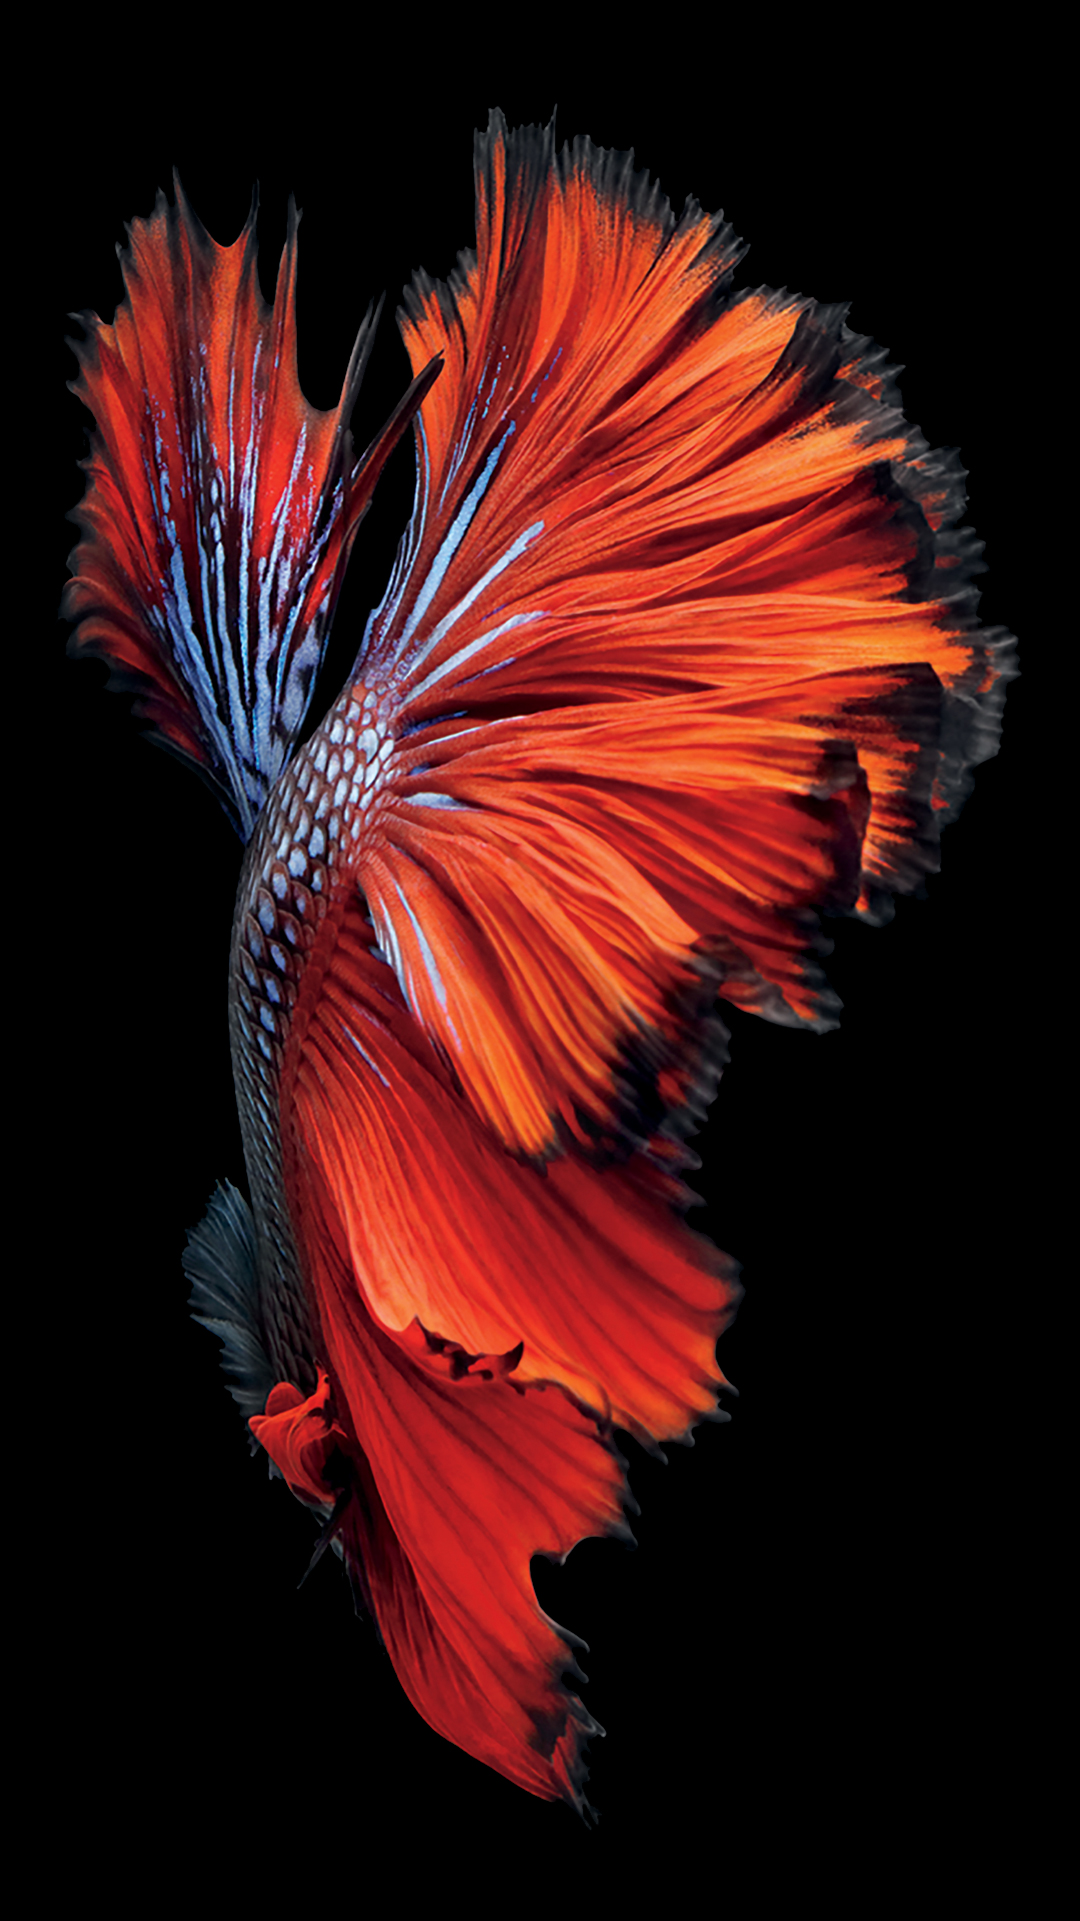 http://media.idownloadblog.com/wp-content/uploads/2015/09/iPhone-6s-Fish-Red-Wallpaper.jpg